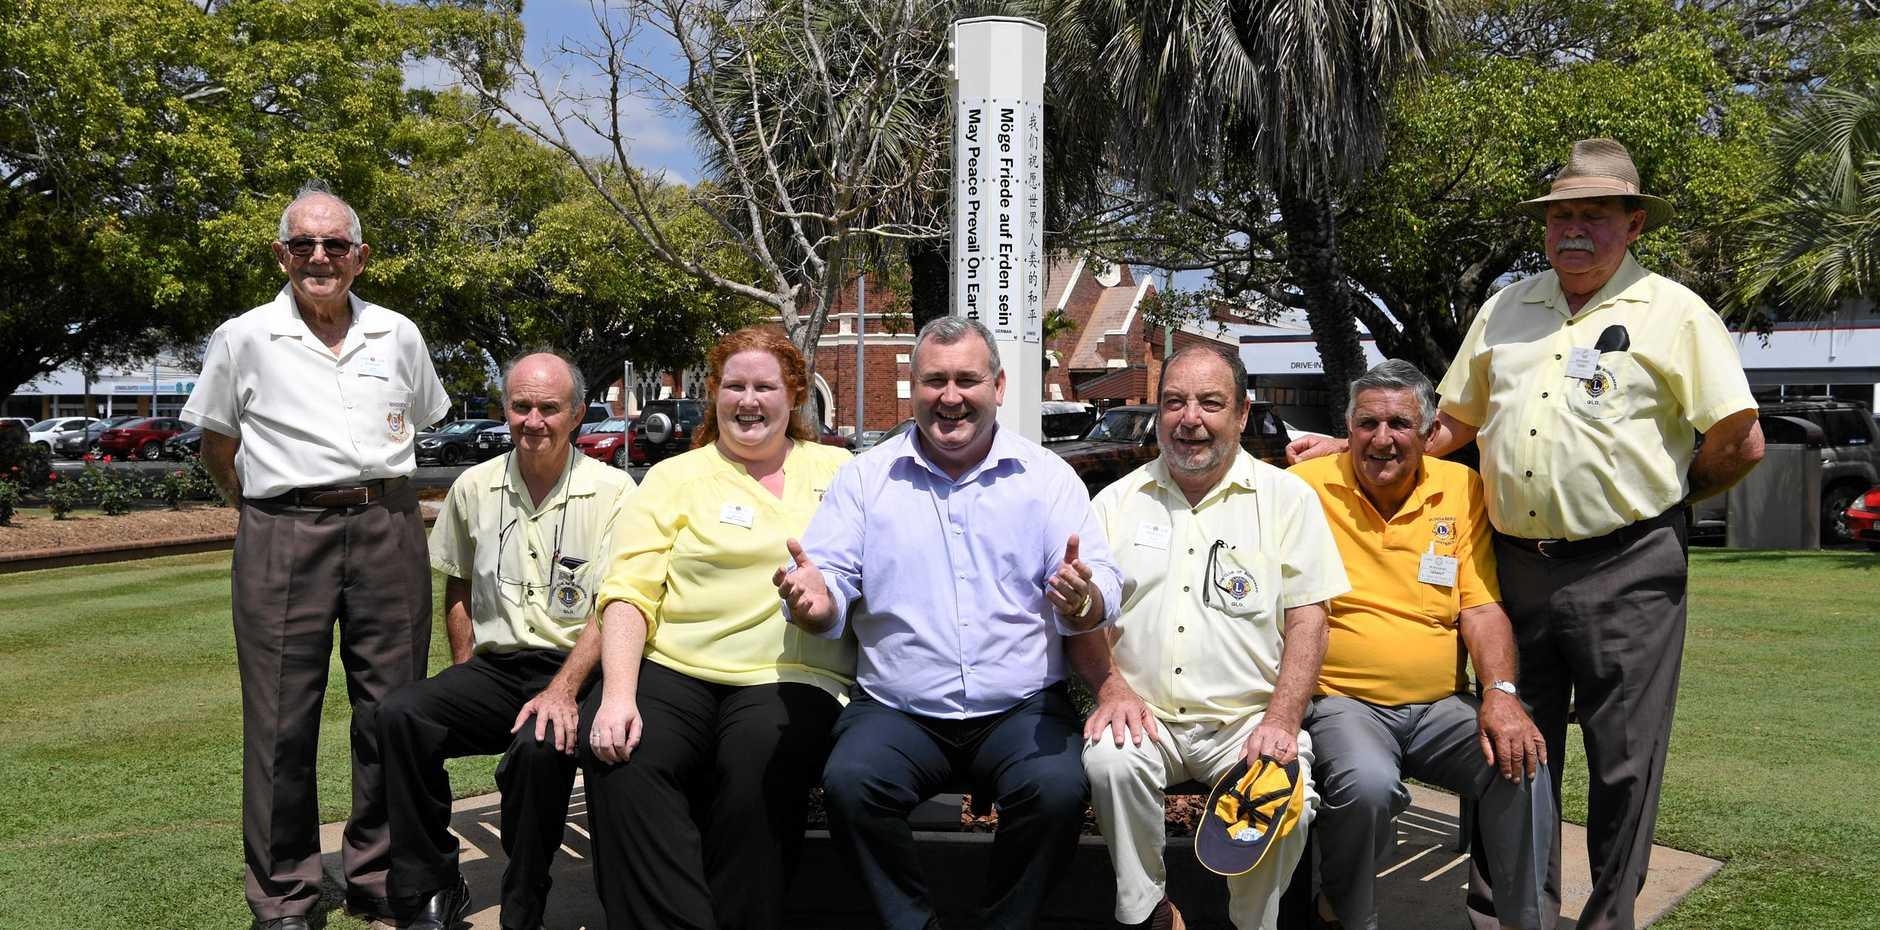 PEACE POLE: Jim Anderson, Alan Williams, Sue Lord, Mayor Jack Dempsey, Rino Gajaldon, Grant Macdonald and Terry Cunningham in Buss Park.